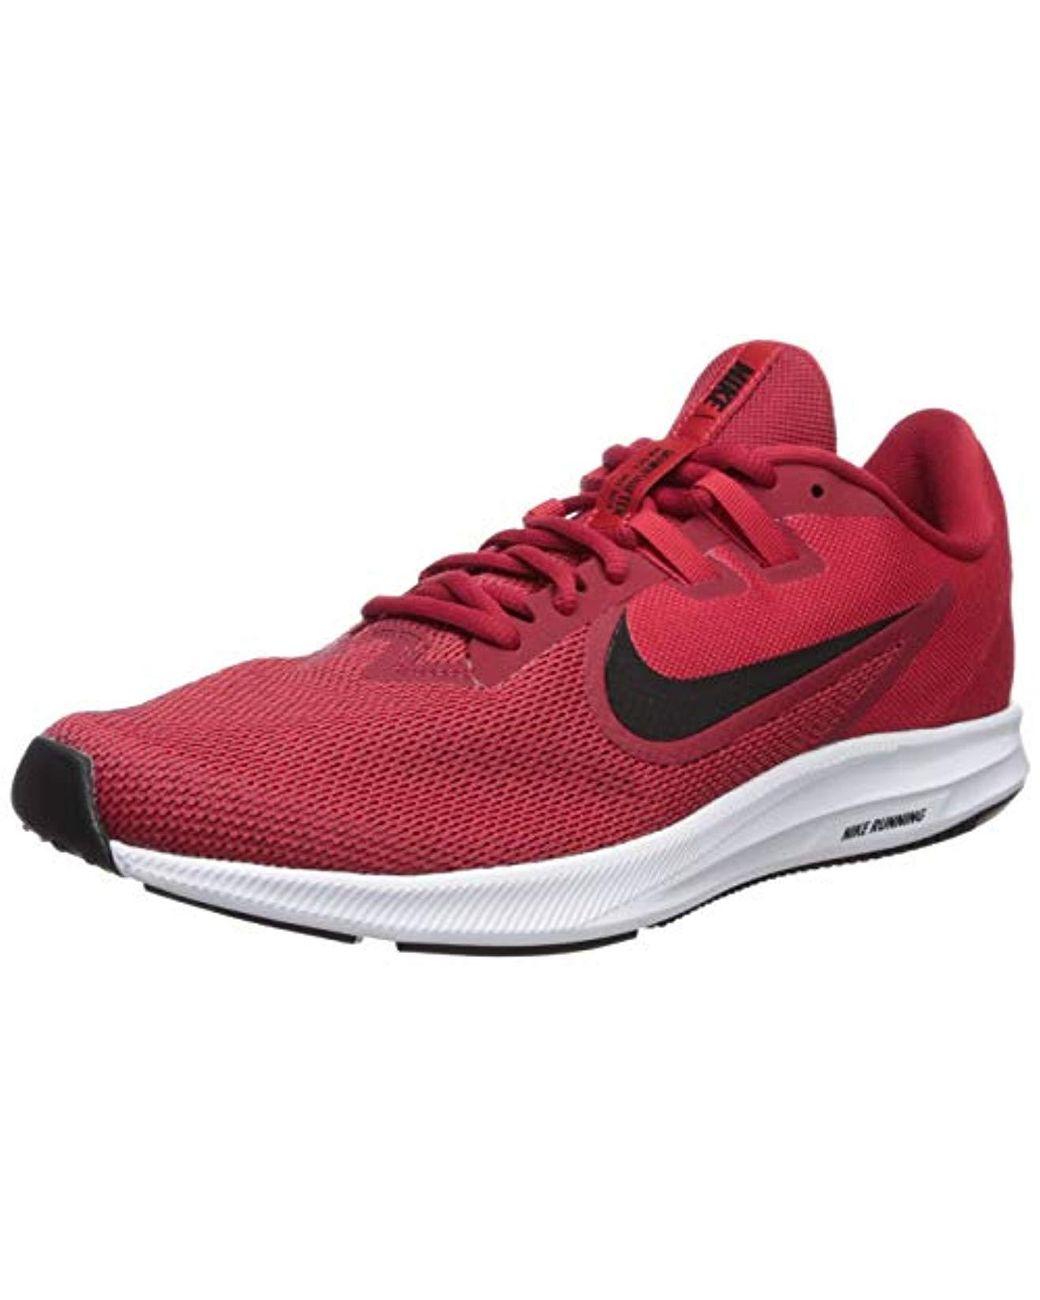 d3452ebcfbeb60 Nike. Men s Downshifter 9 Sneaker Gym Black-university Red-white ...